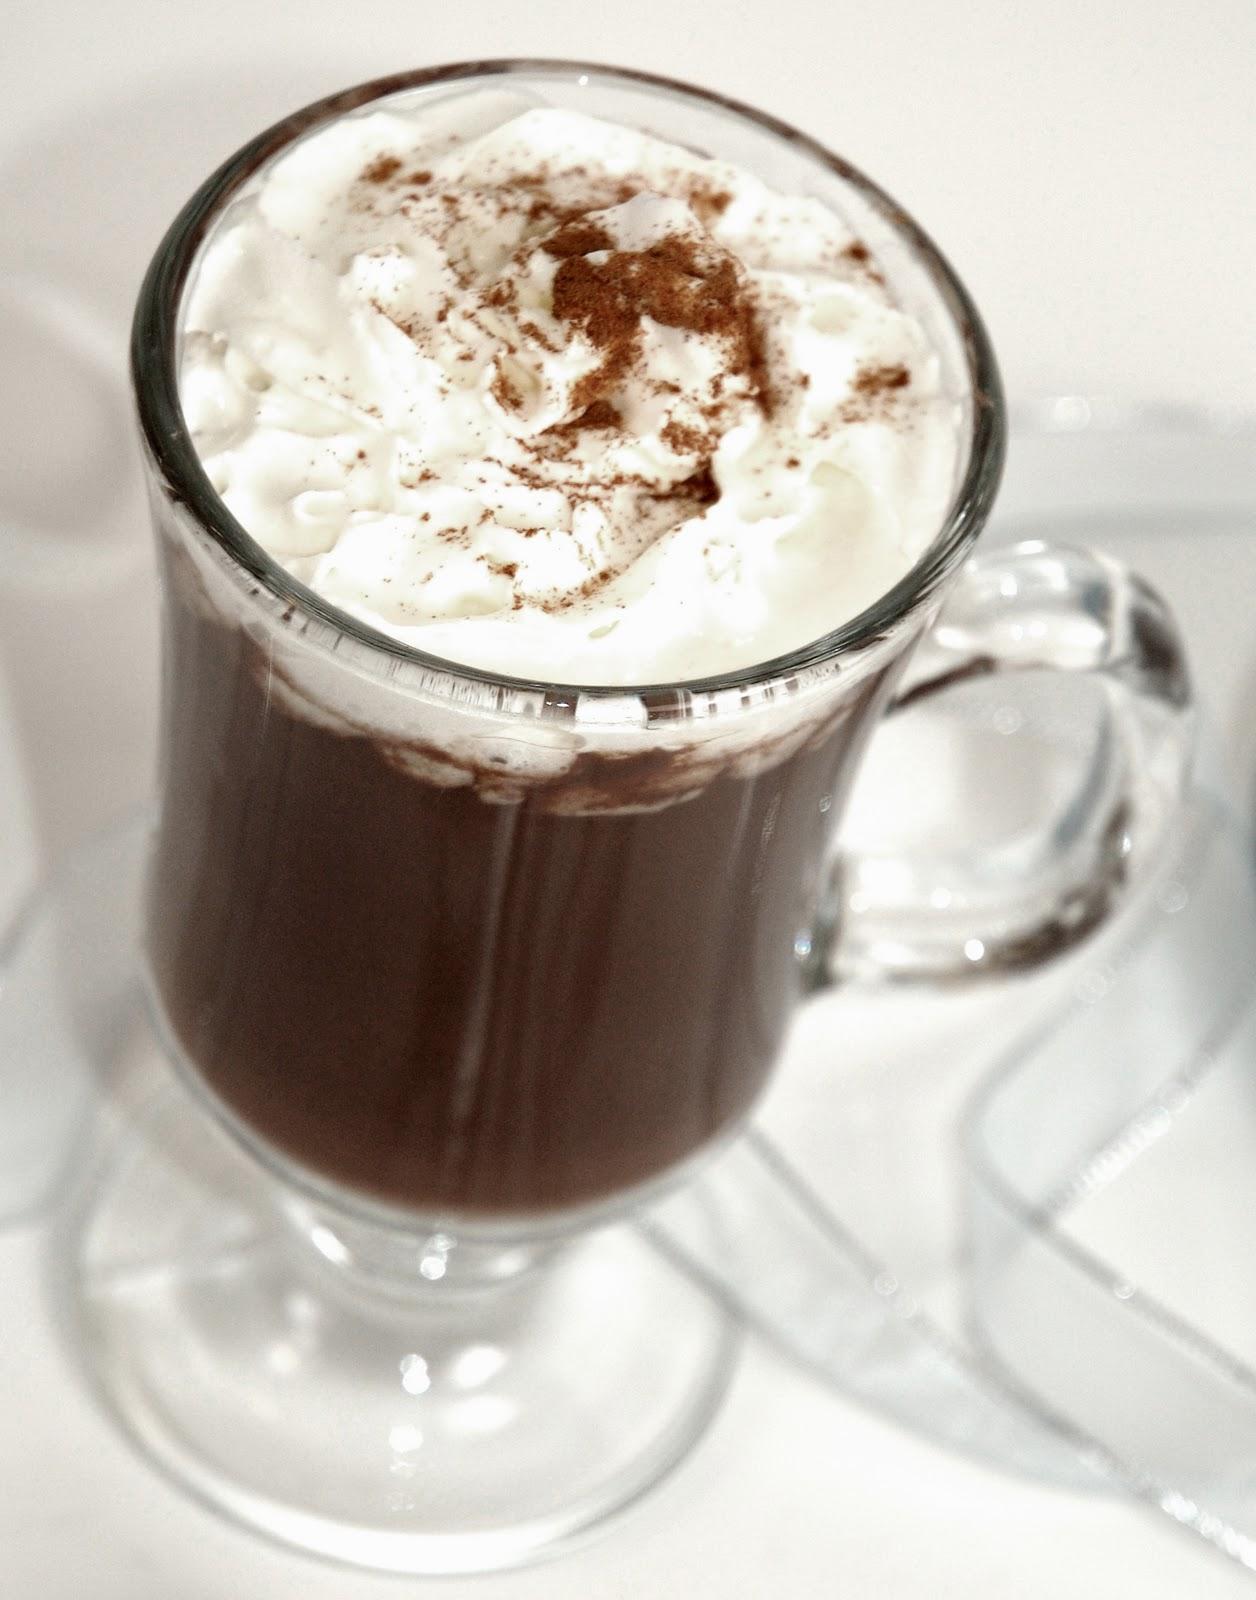 hot+chocolate.jpg#hot%20cocoa%20%201256x1600